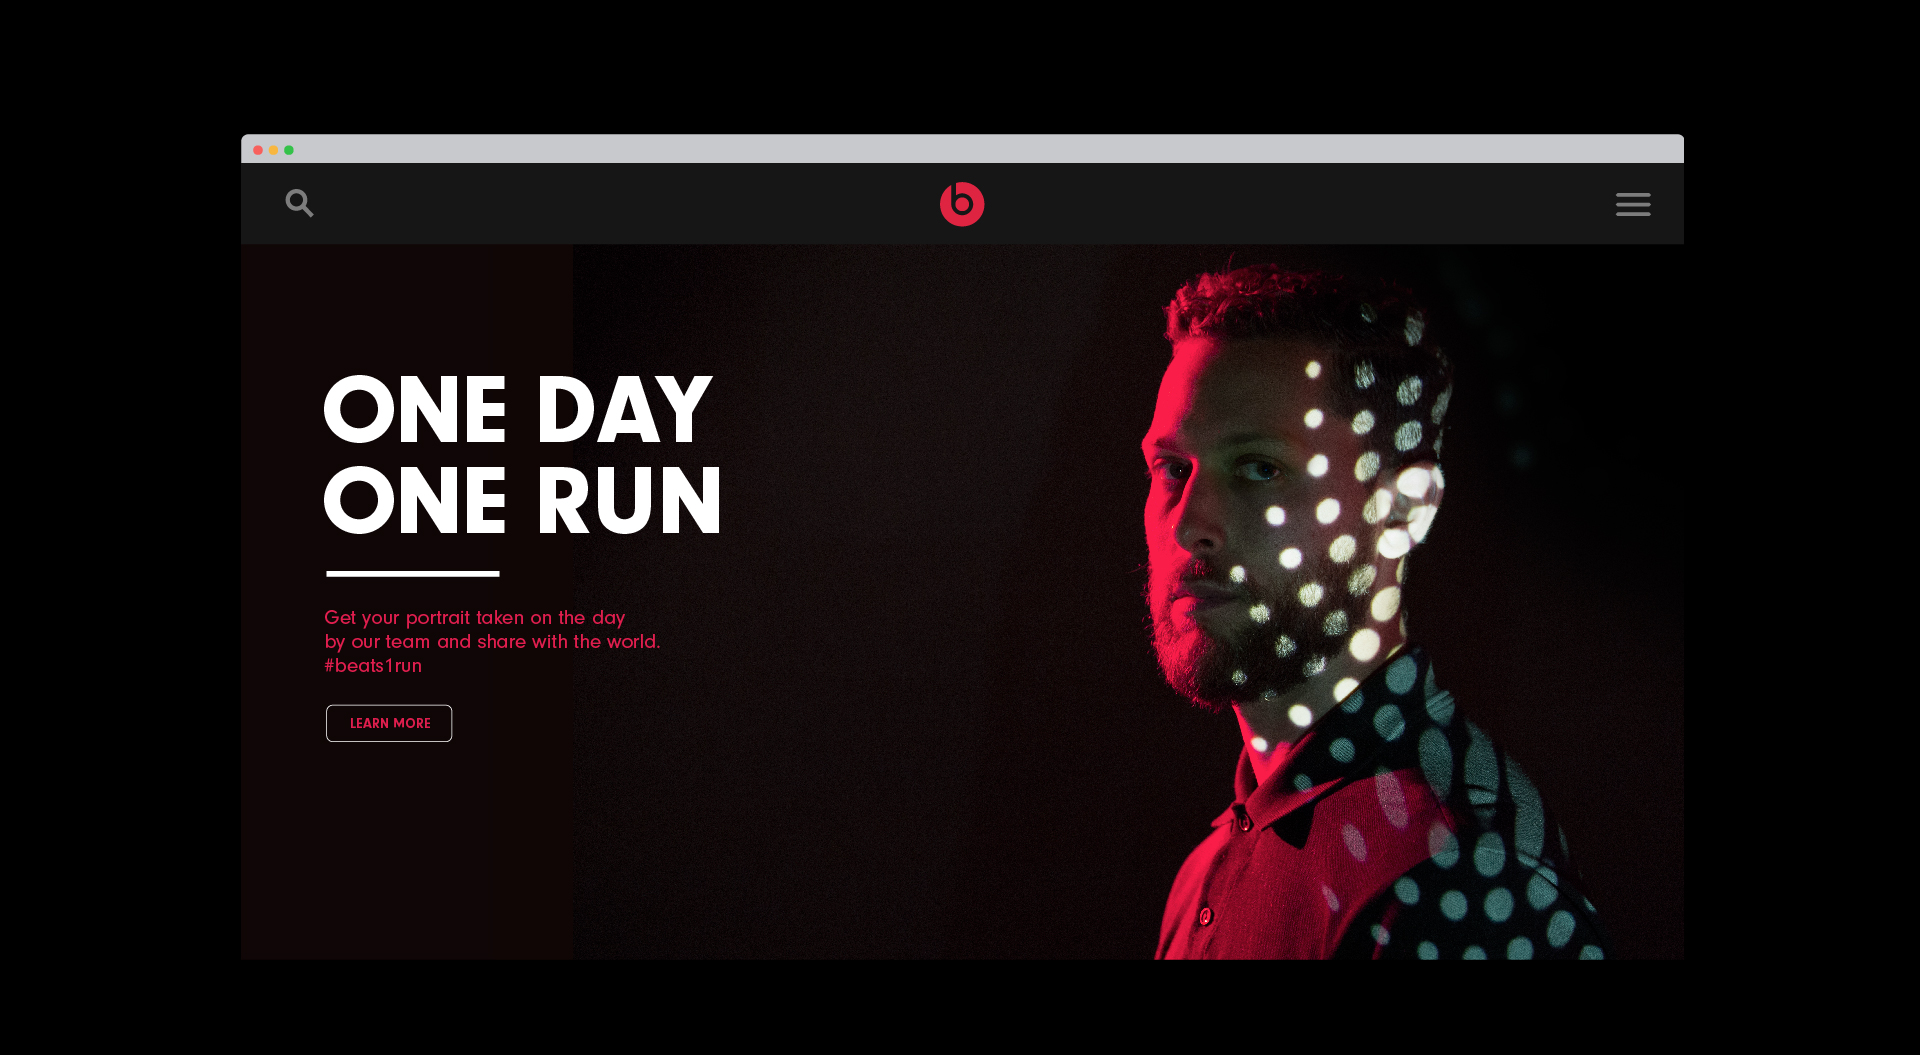 one-run-desktops-02